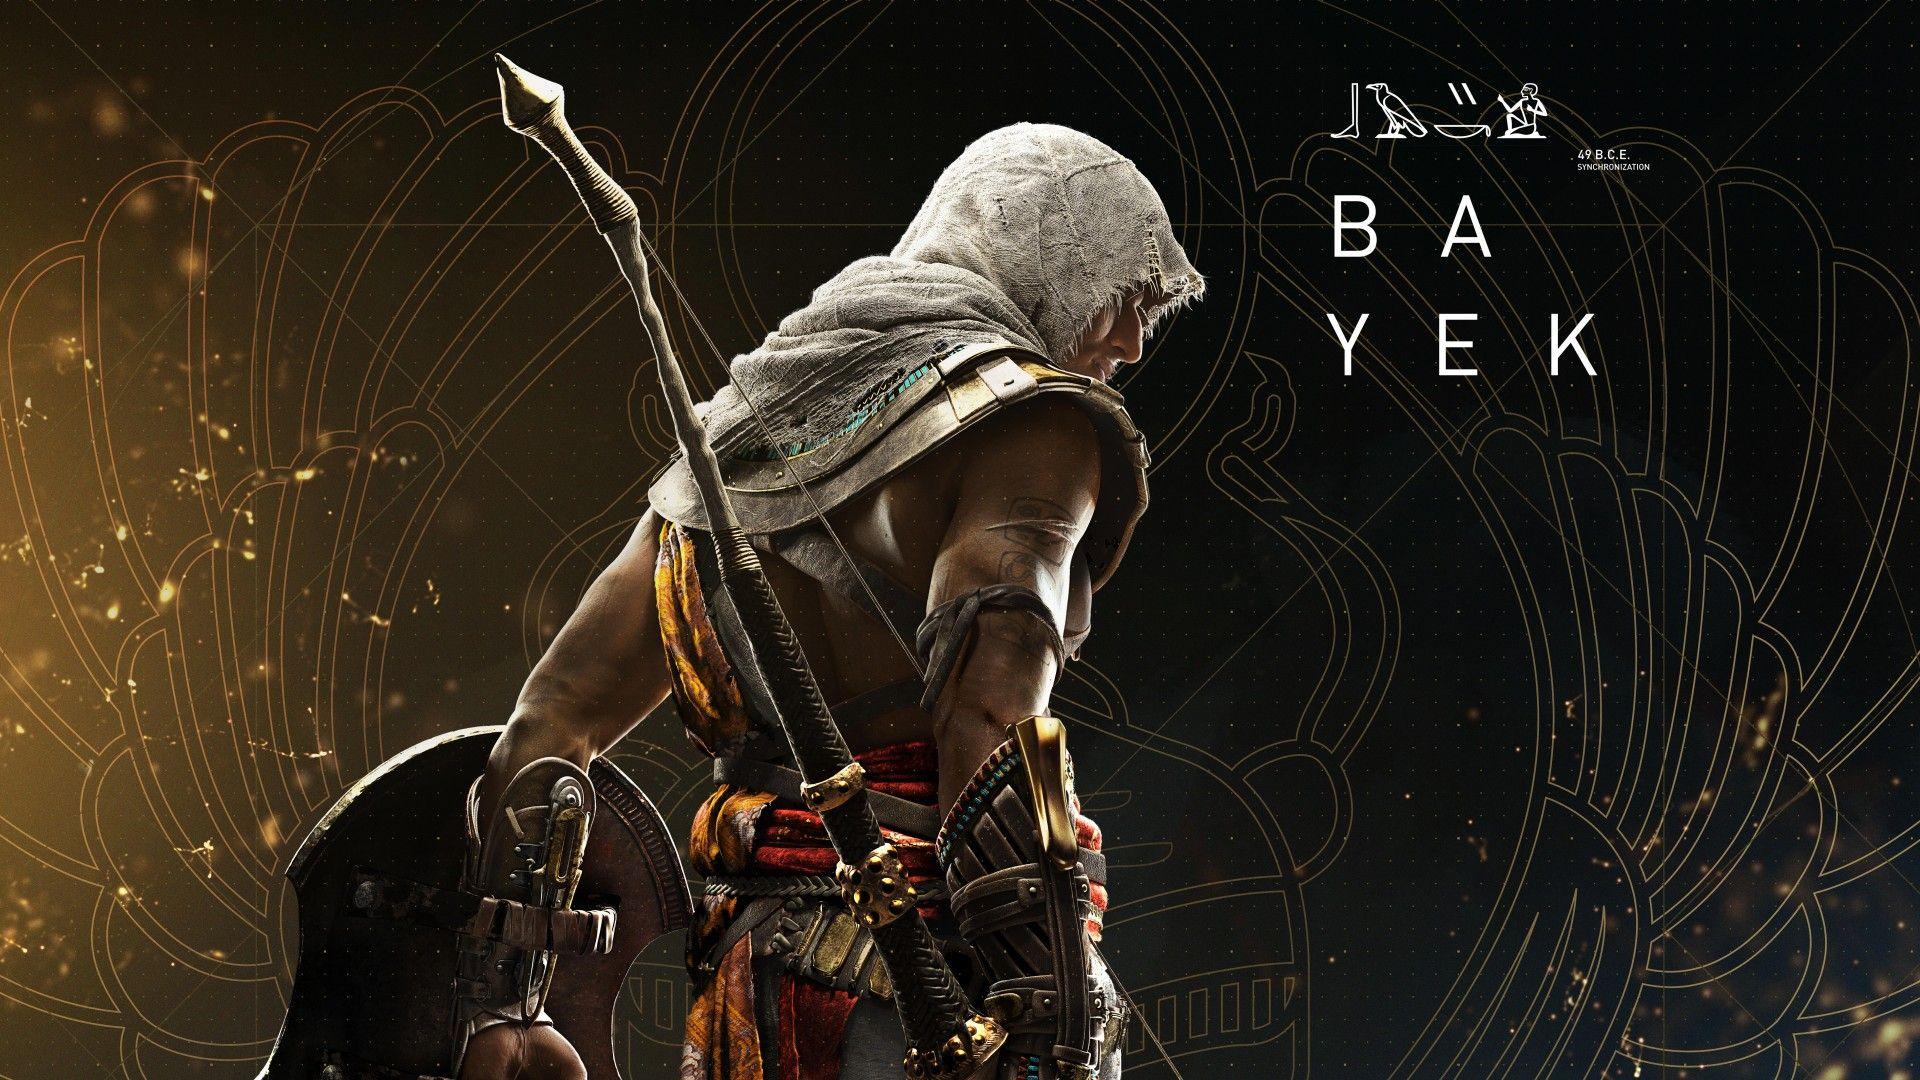 Bayek Assassin S Creed Origins 4k 8k Assassin S Creed Wallpaper Assassins Creed Assassins Creed Origins